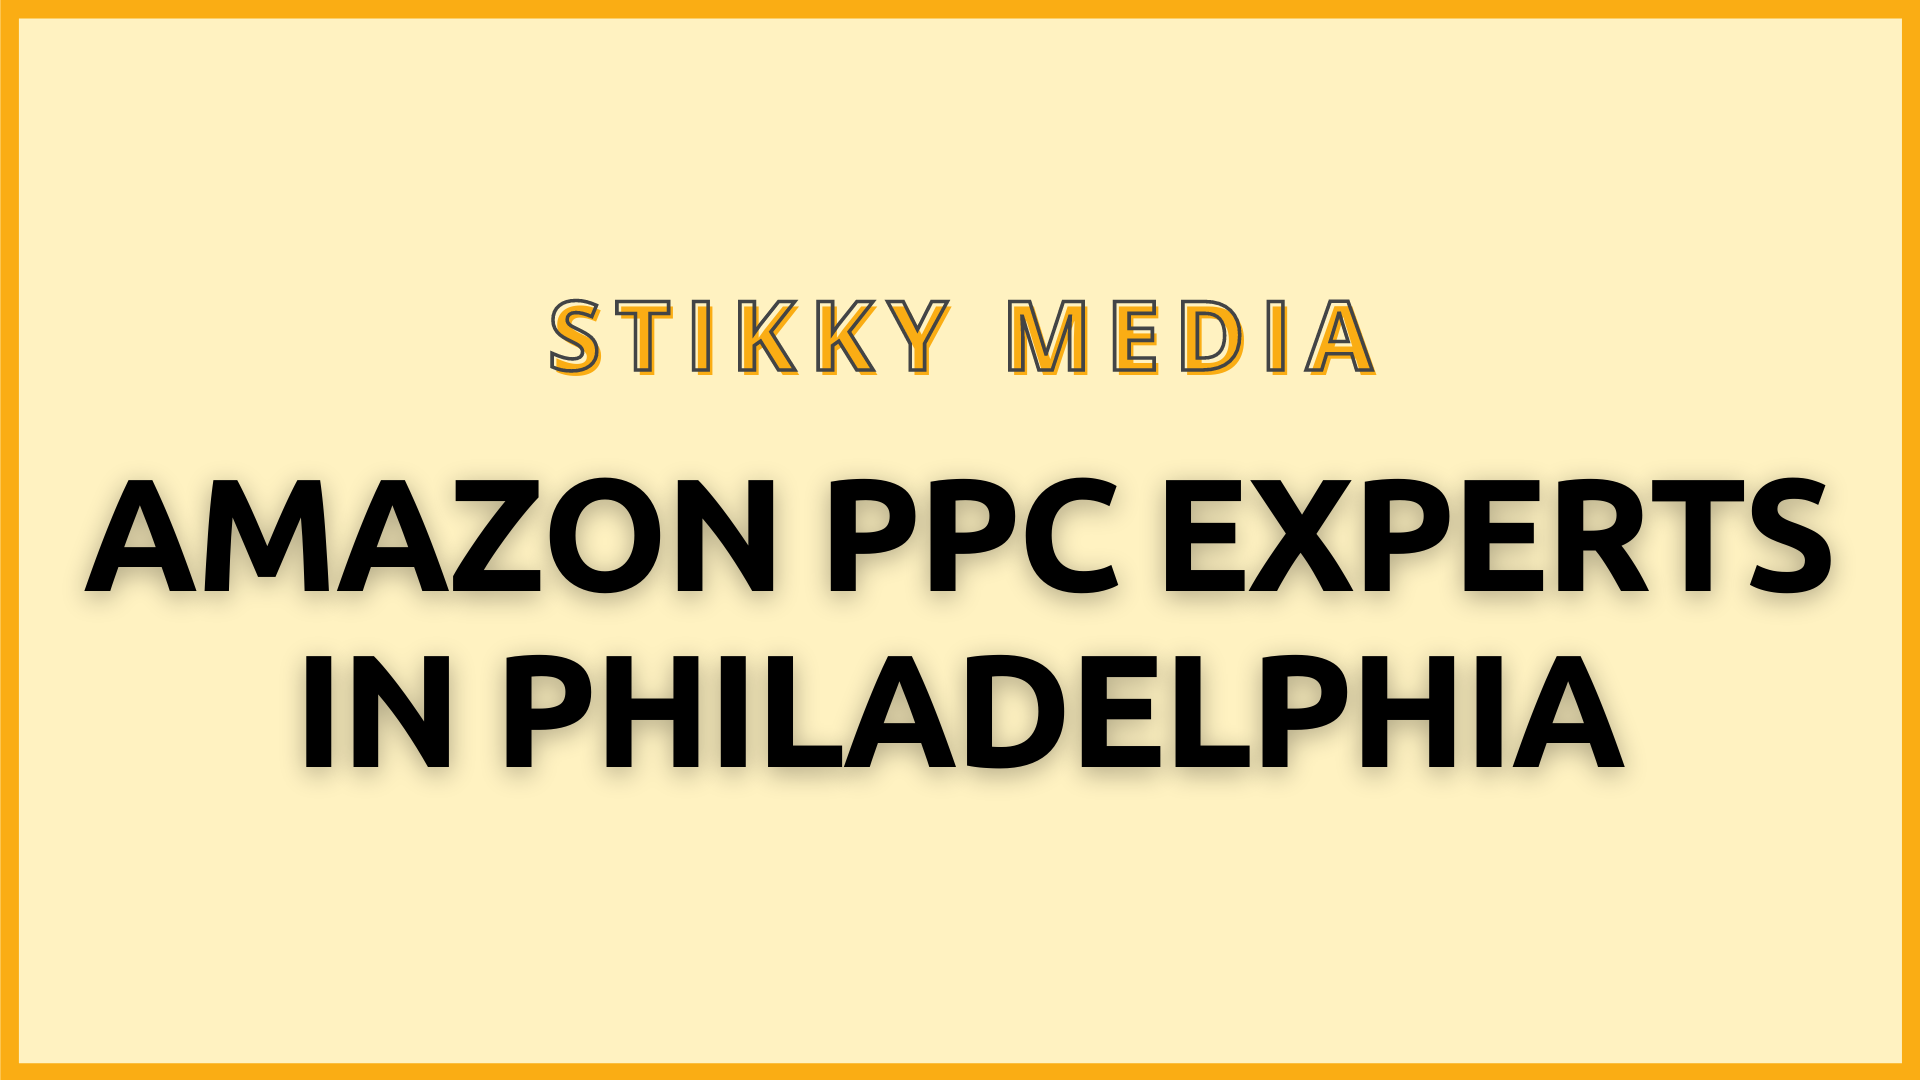 Amazon PPC Management in Philadelphia - Stikky Media